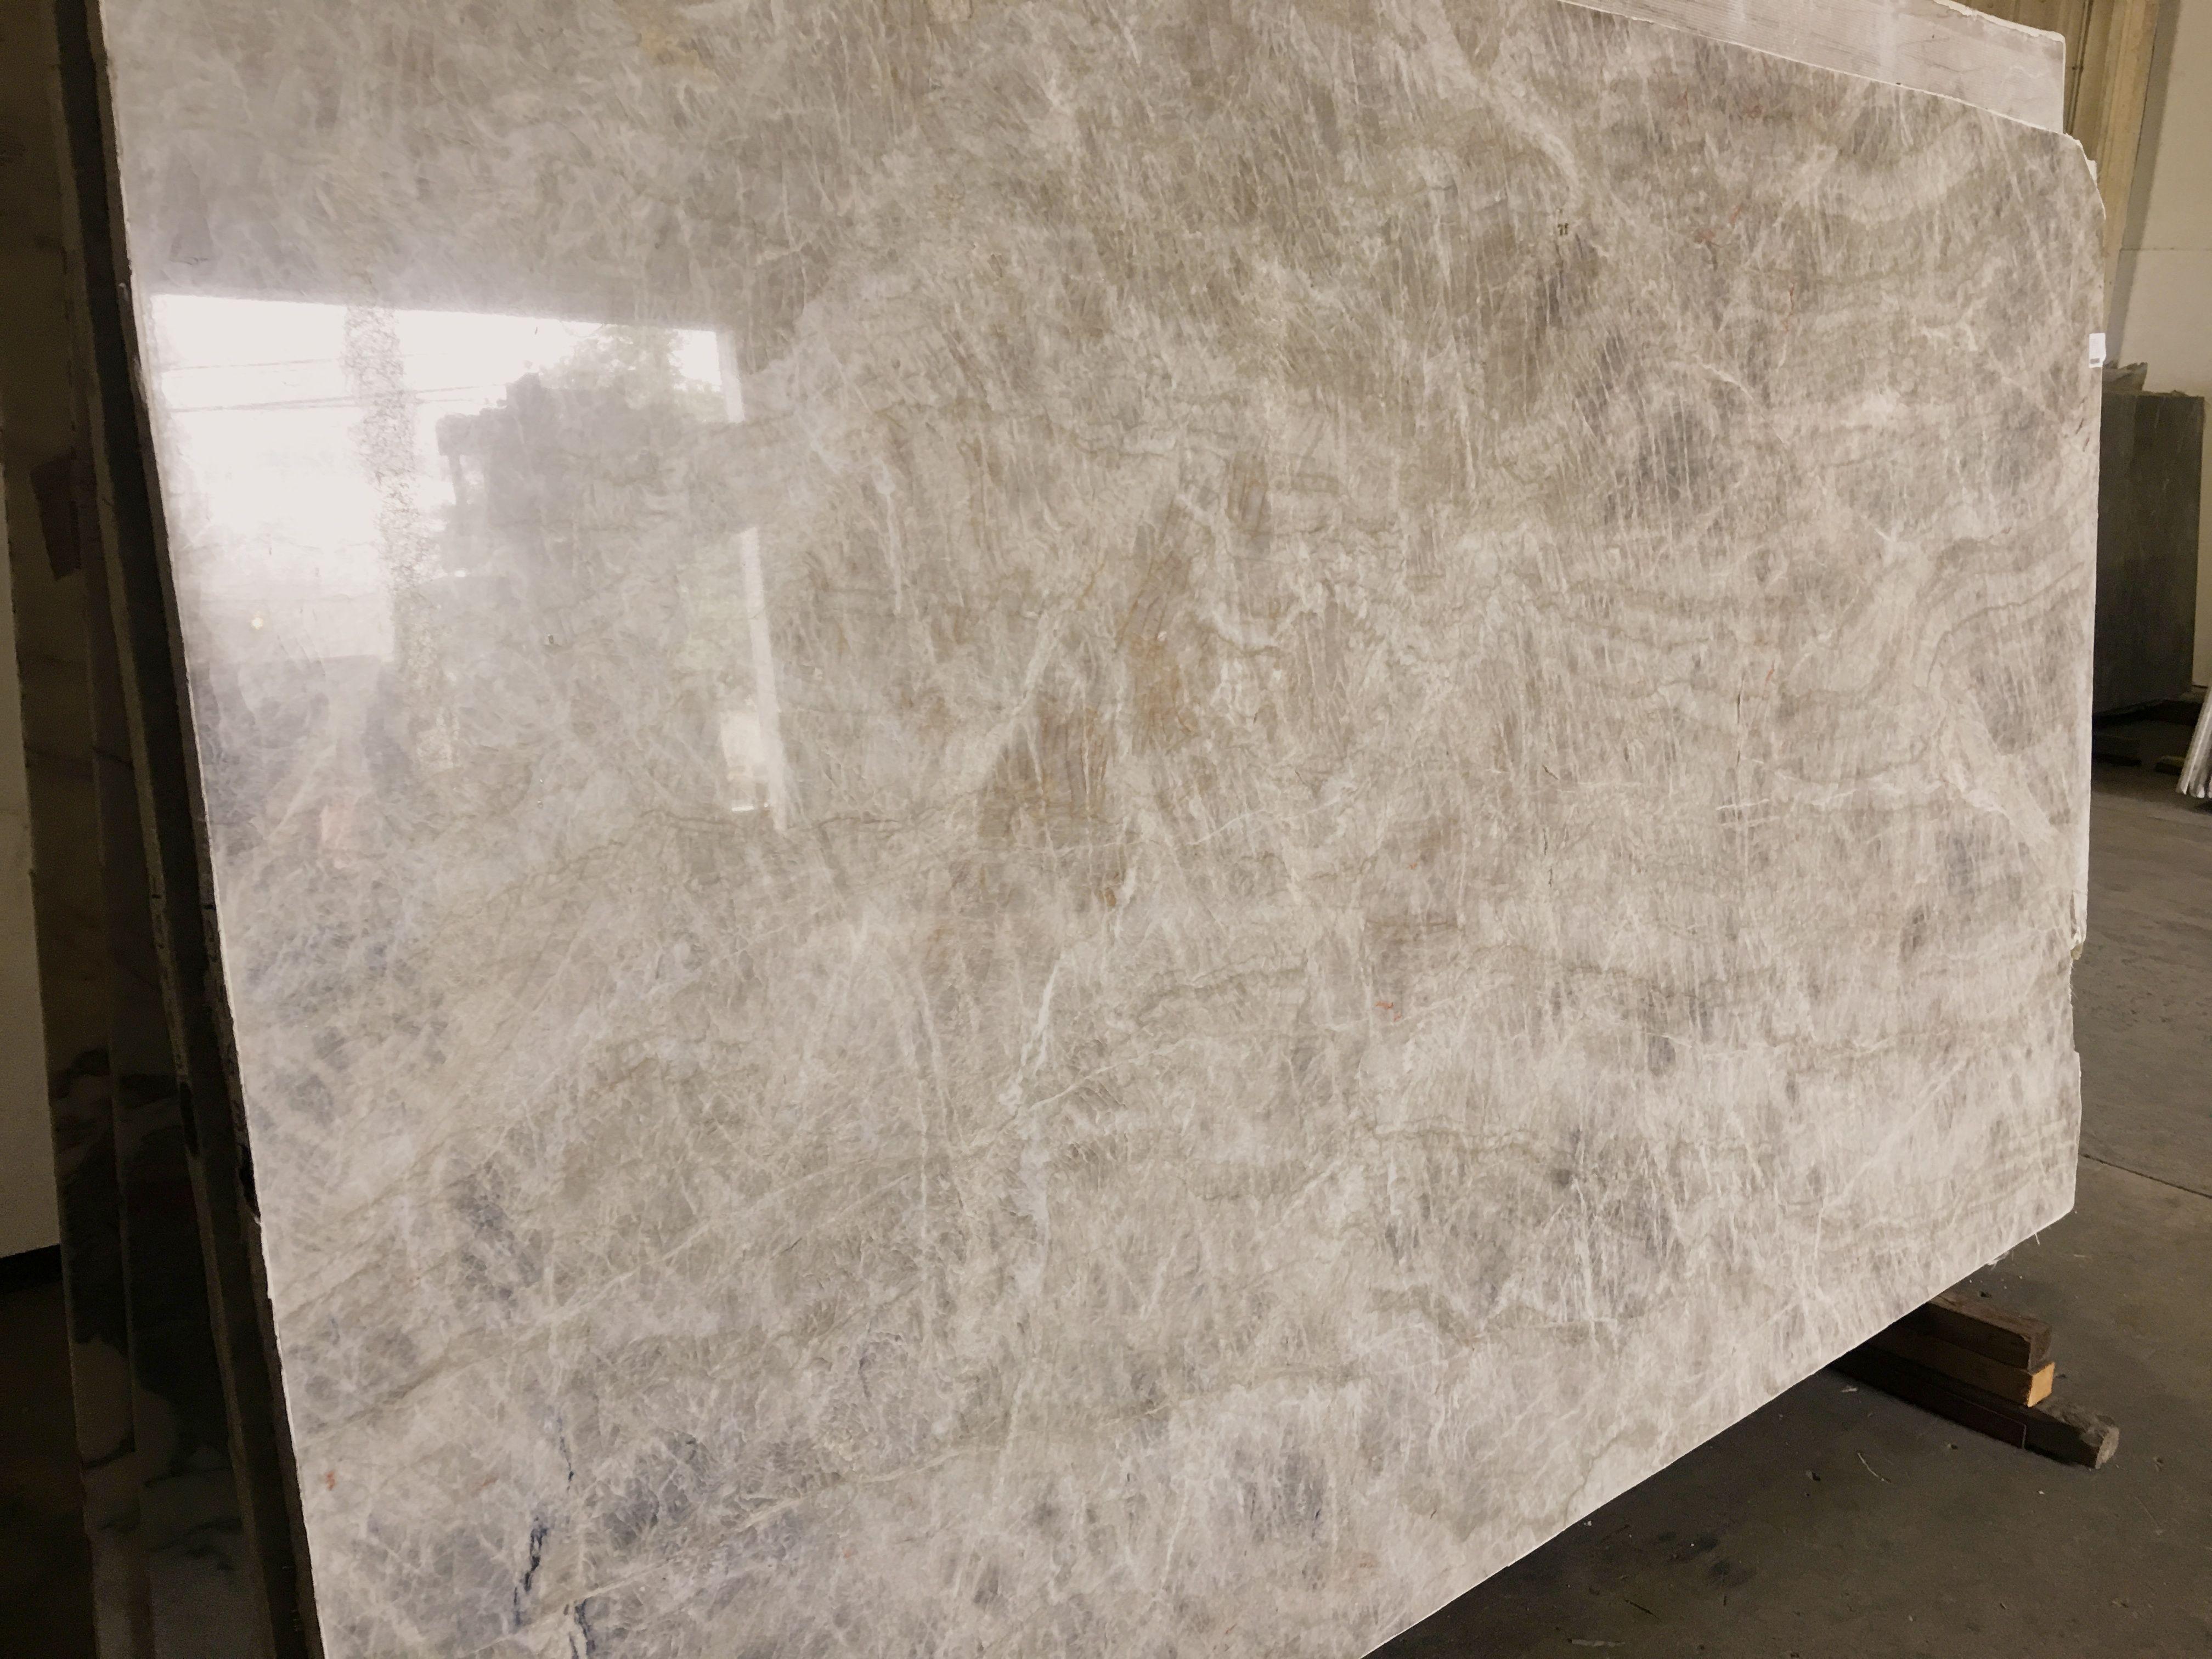 Mother Of Pearl 3cm Quartzite Slabs Quartzite Natural Stone Slabs Stone Tiles